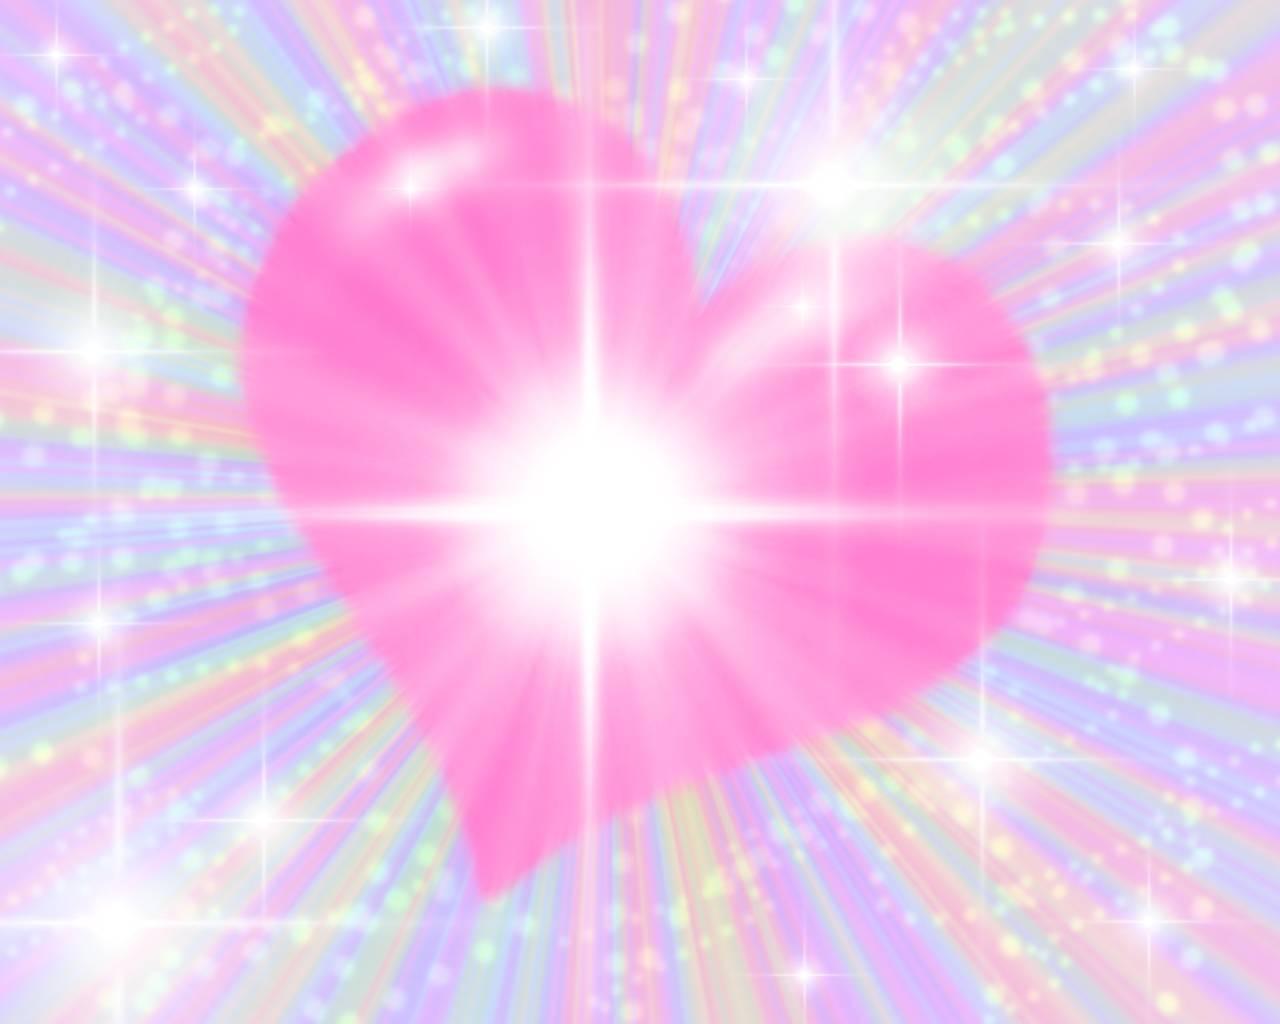 Abstract Heart Art Backgrounds